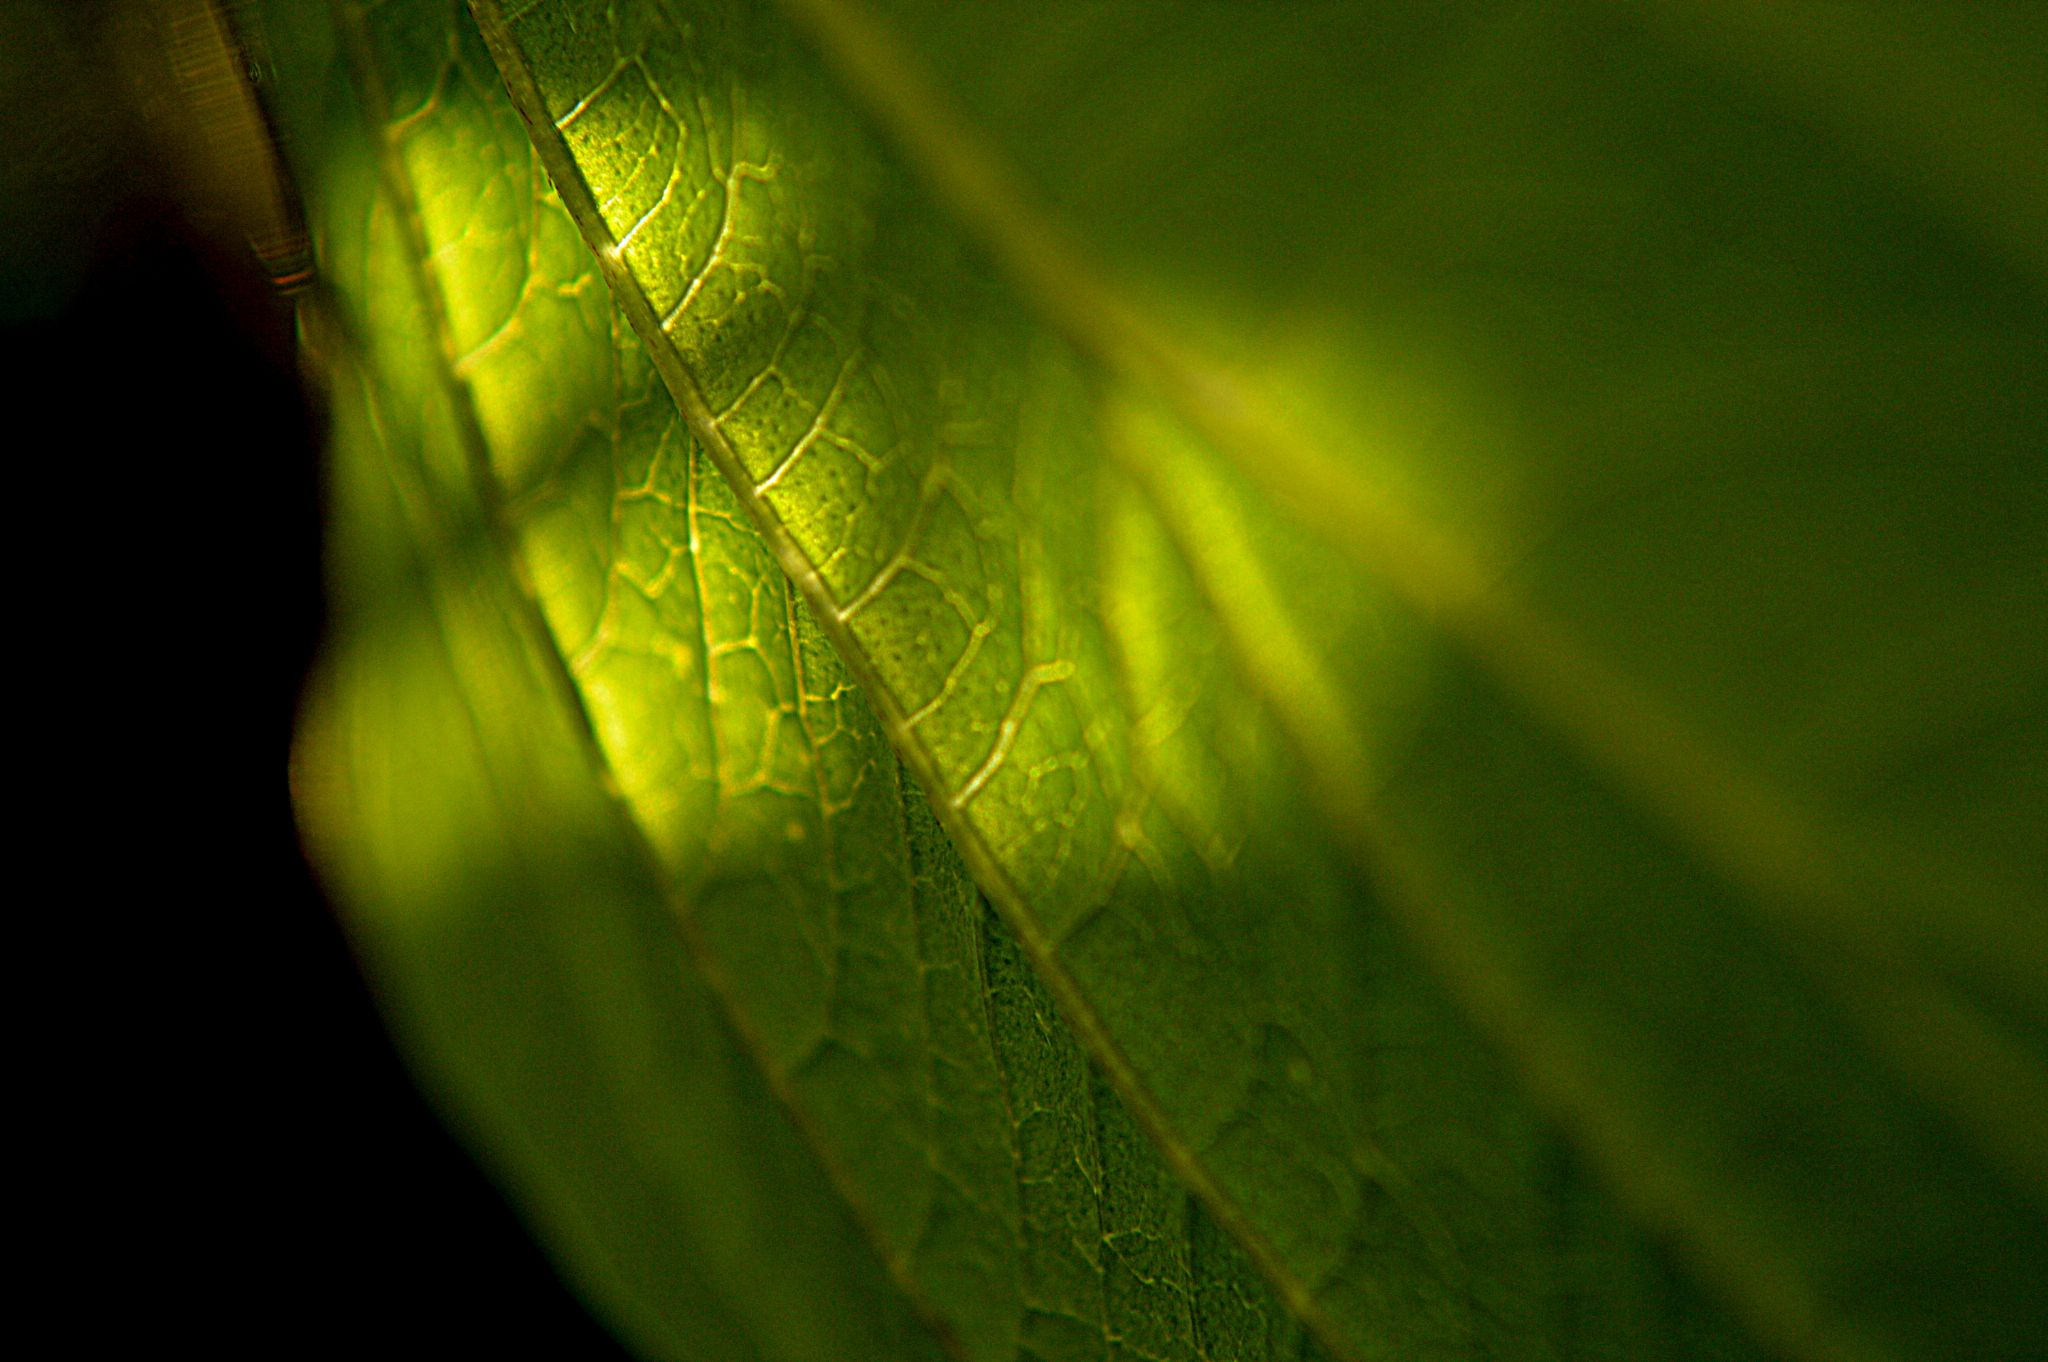 Leaf macro with sunlight by Kayjay18